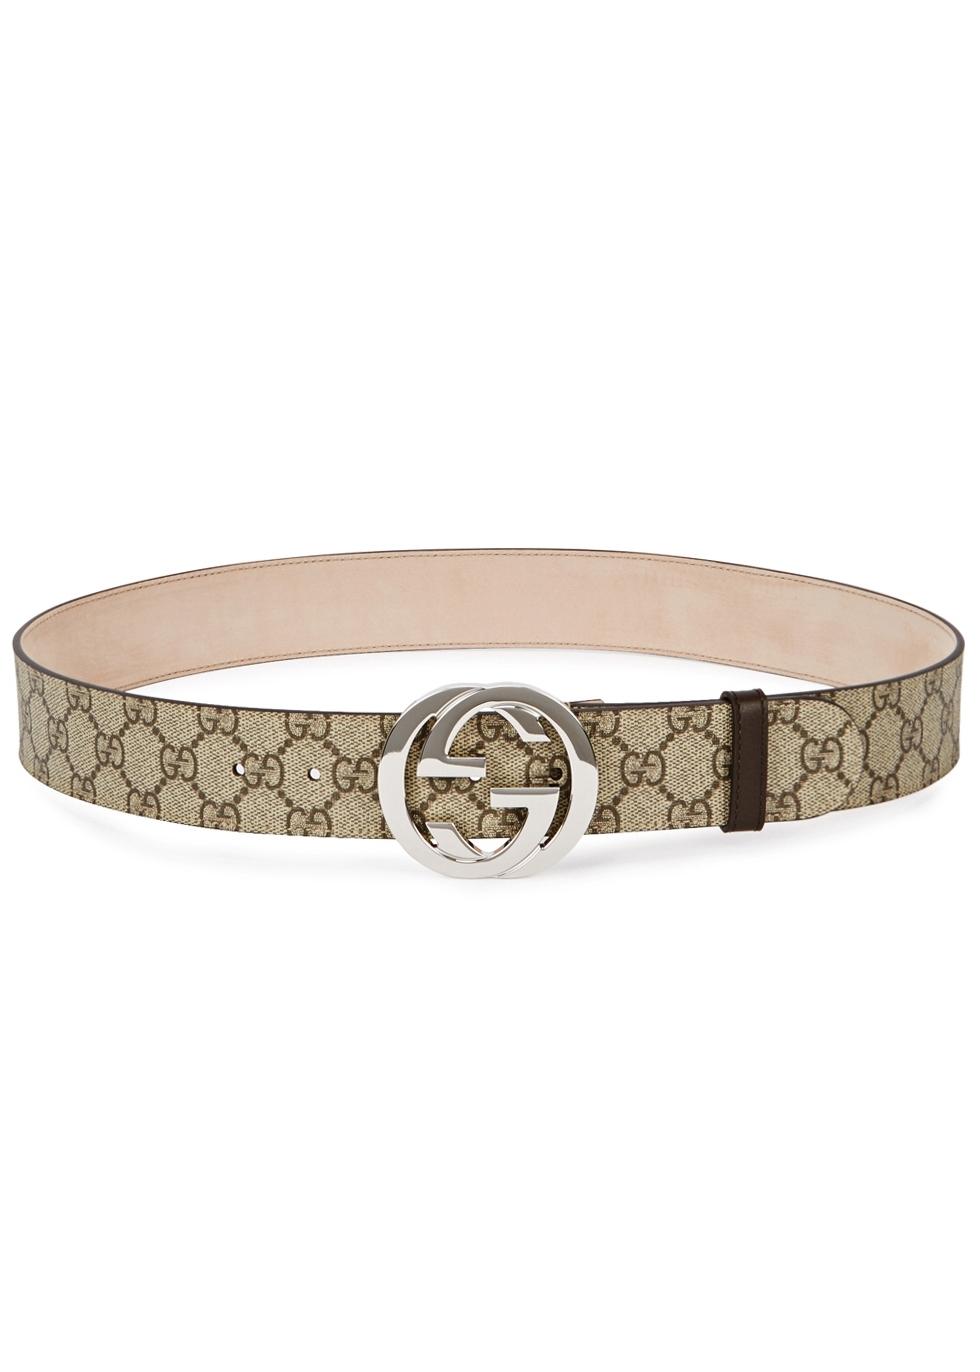 9c7bb312e8b Men s Designer Belts and Accessories - Harvey Nichols